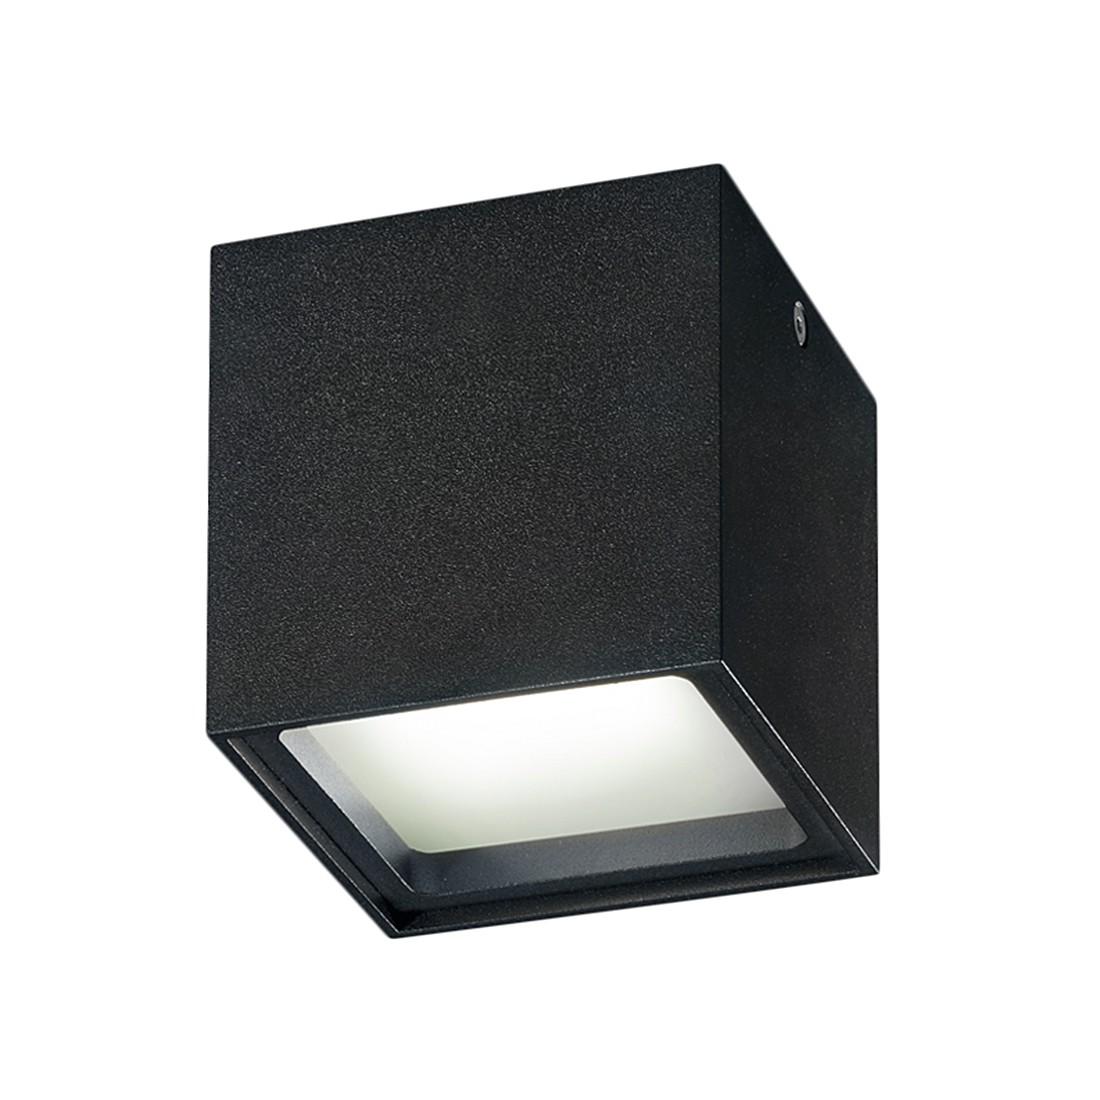 deckenleuchte siri led metall schwarz helestra a online. Black Bedroom Furniture Sets. Home Design Ideas